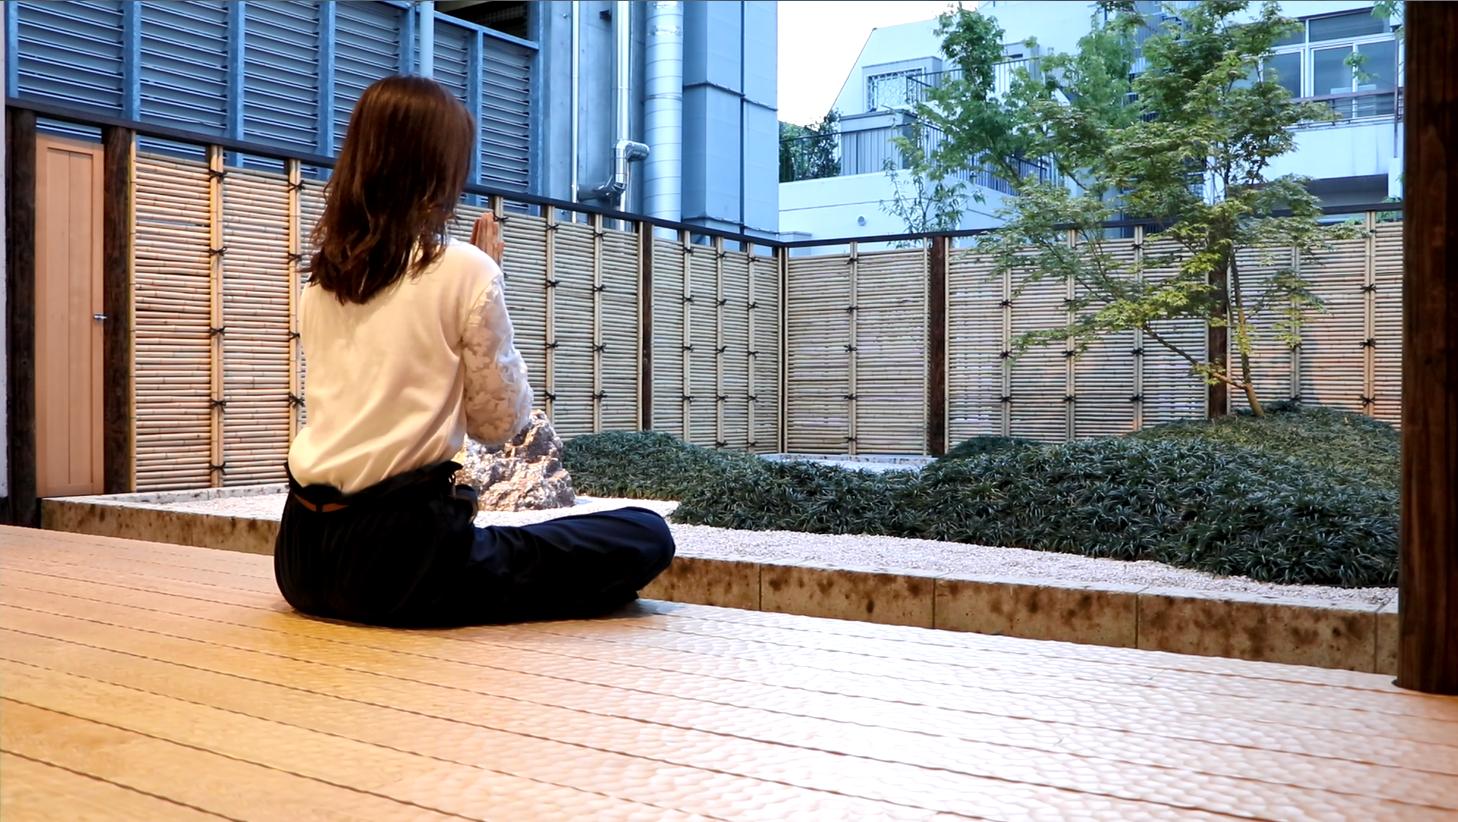 Akasaka Zen Space | 日本庭園を望みながら上質な時間をお楽しみいただけます。|TIME SHARING|タイムシェアリング |スペースマネジメント|あどばる|adval